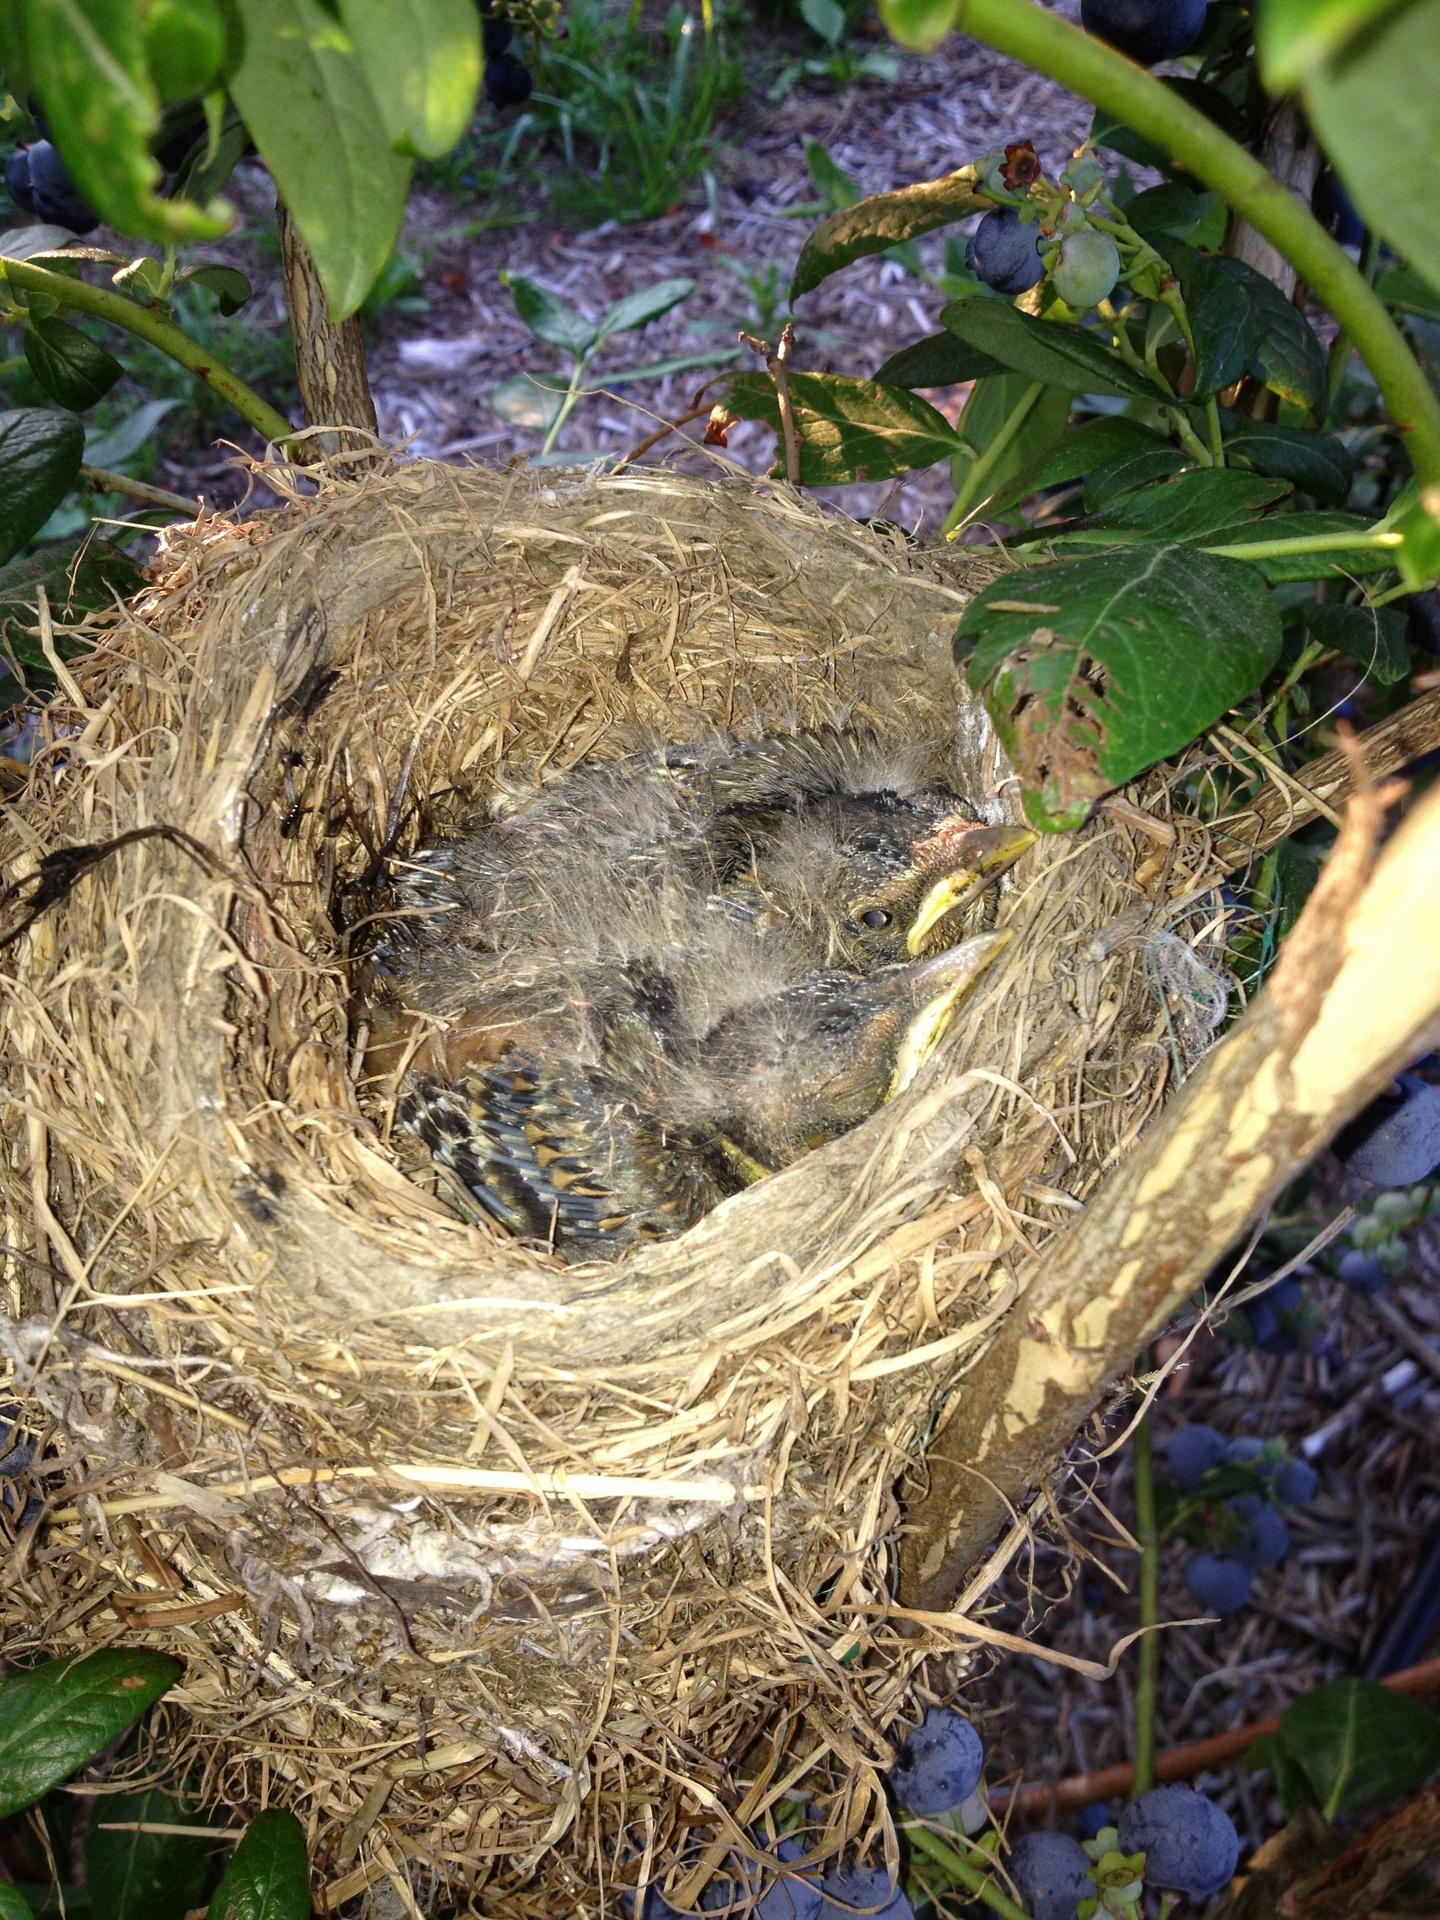 baby birds in a blueberry bush